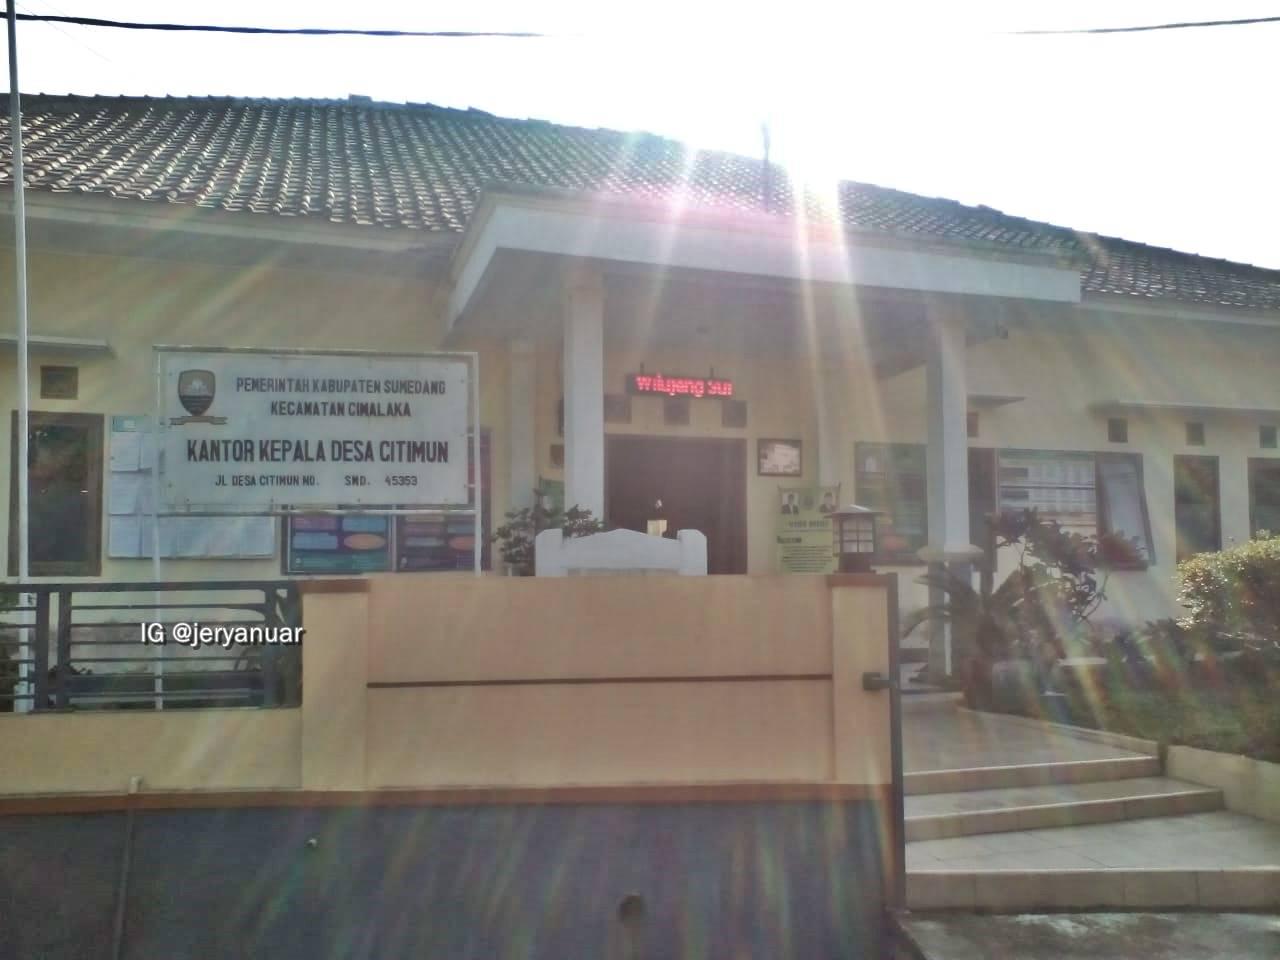 Kantor Desa Citimun, Kab. Sumedang